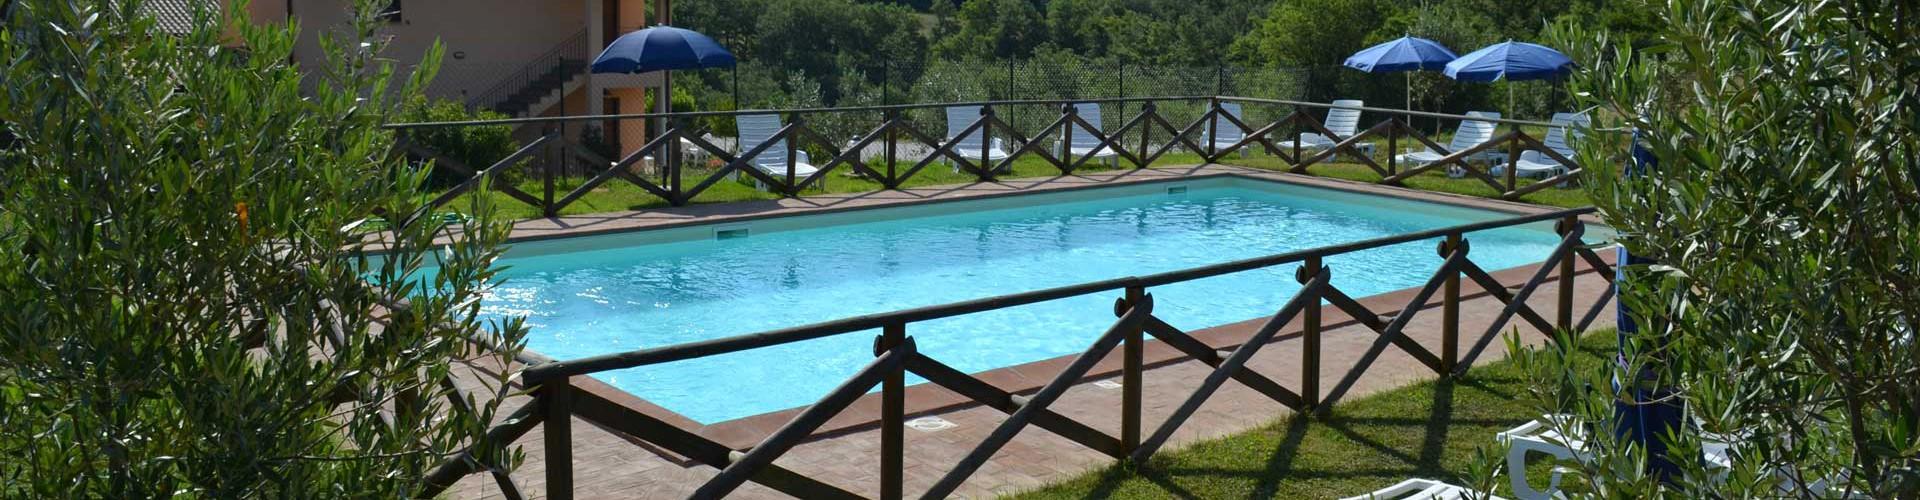 Relais Parco del Subasio | Agriturismo Assisi - Servizi Featured Image